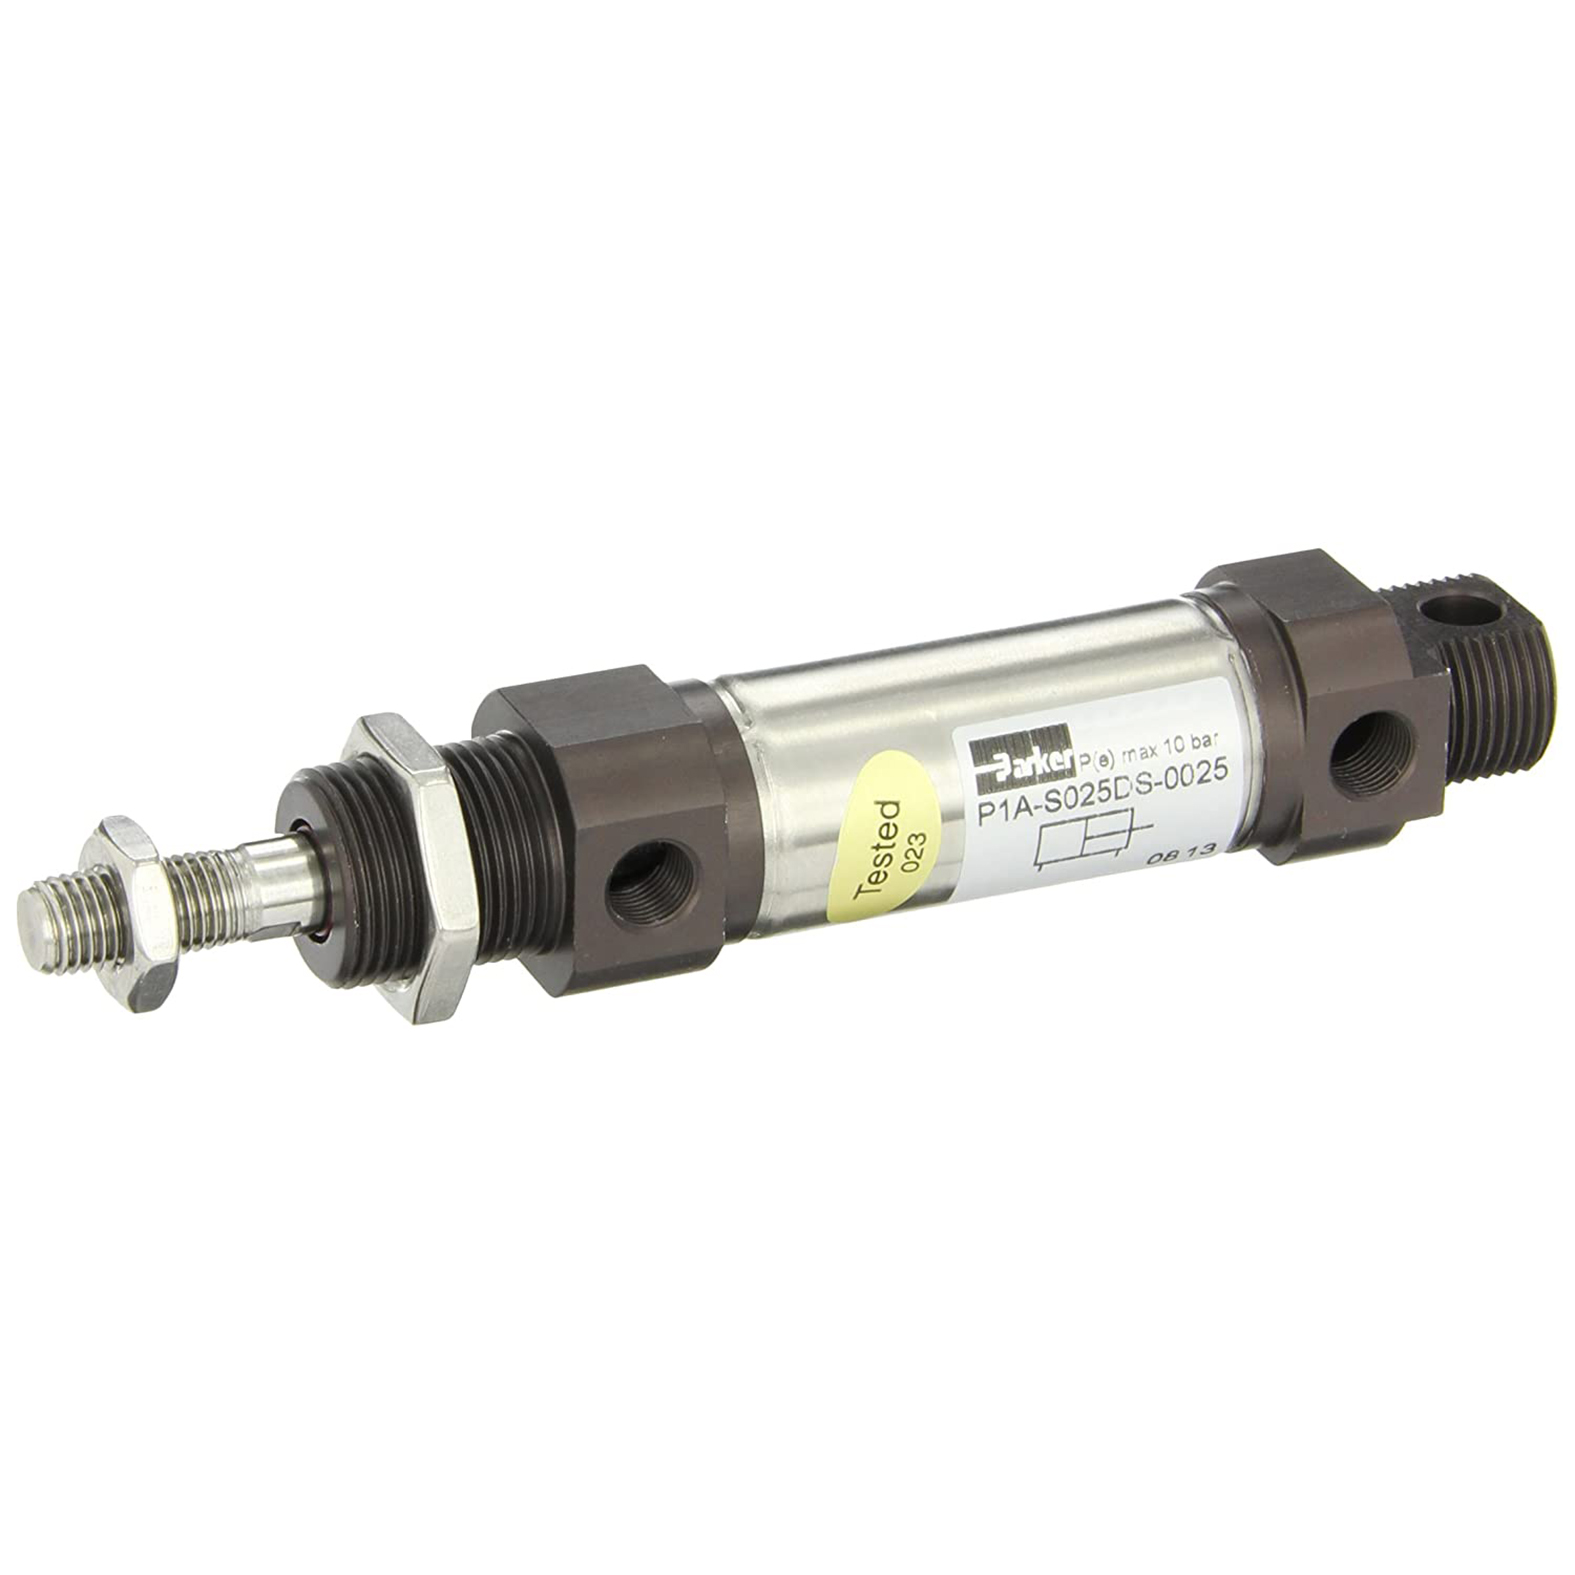 parker-cilindro-surmaq-p1a-2